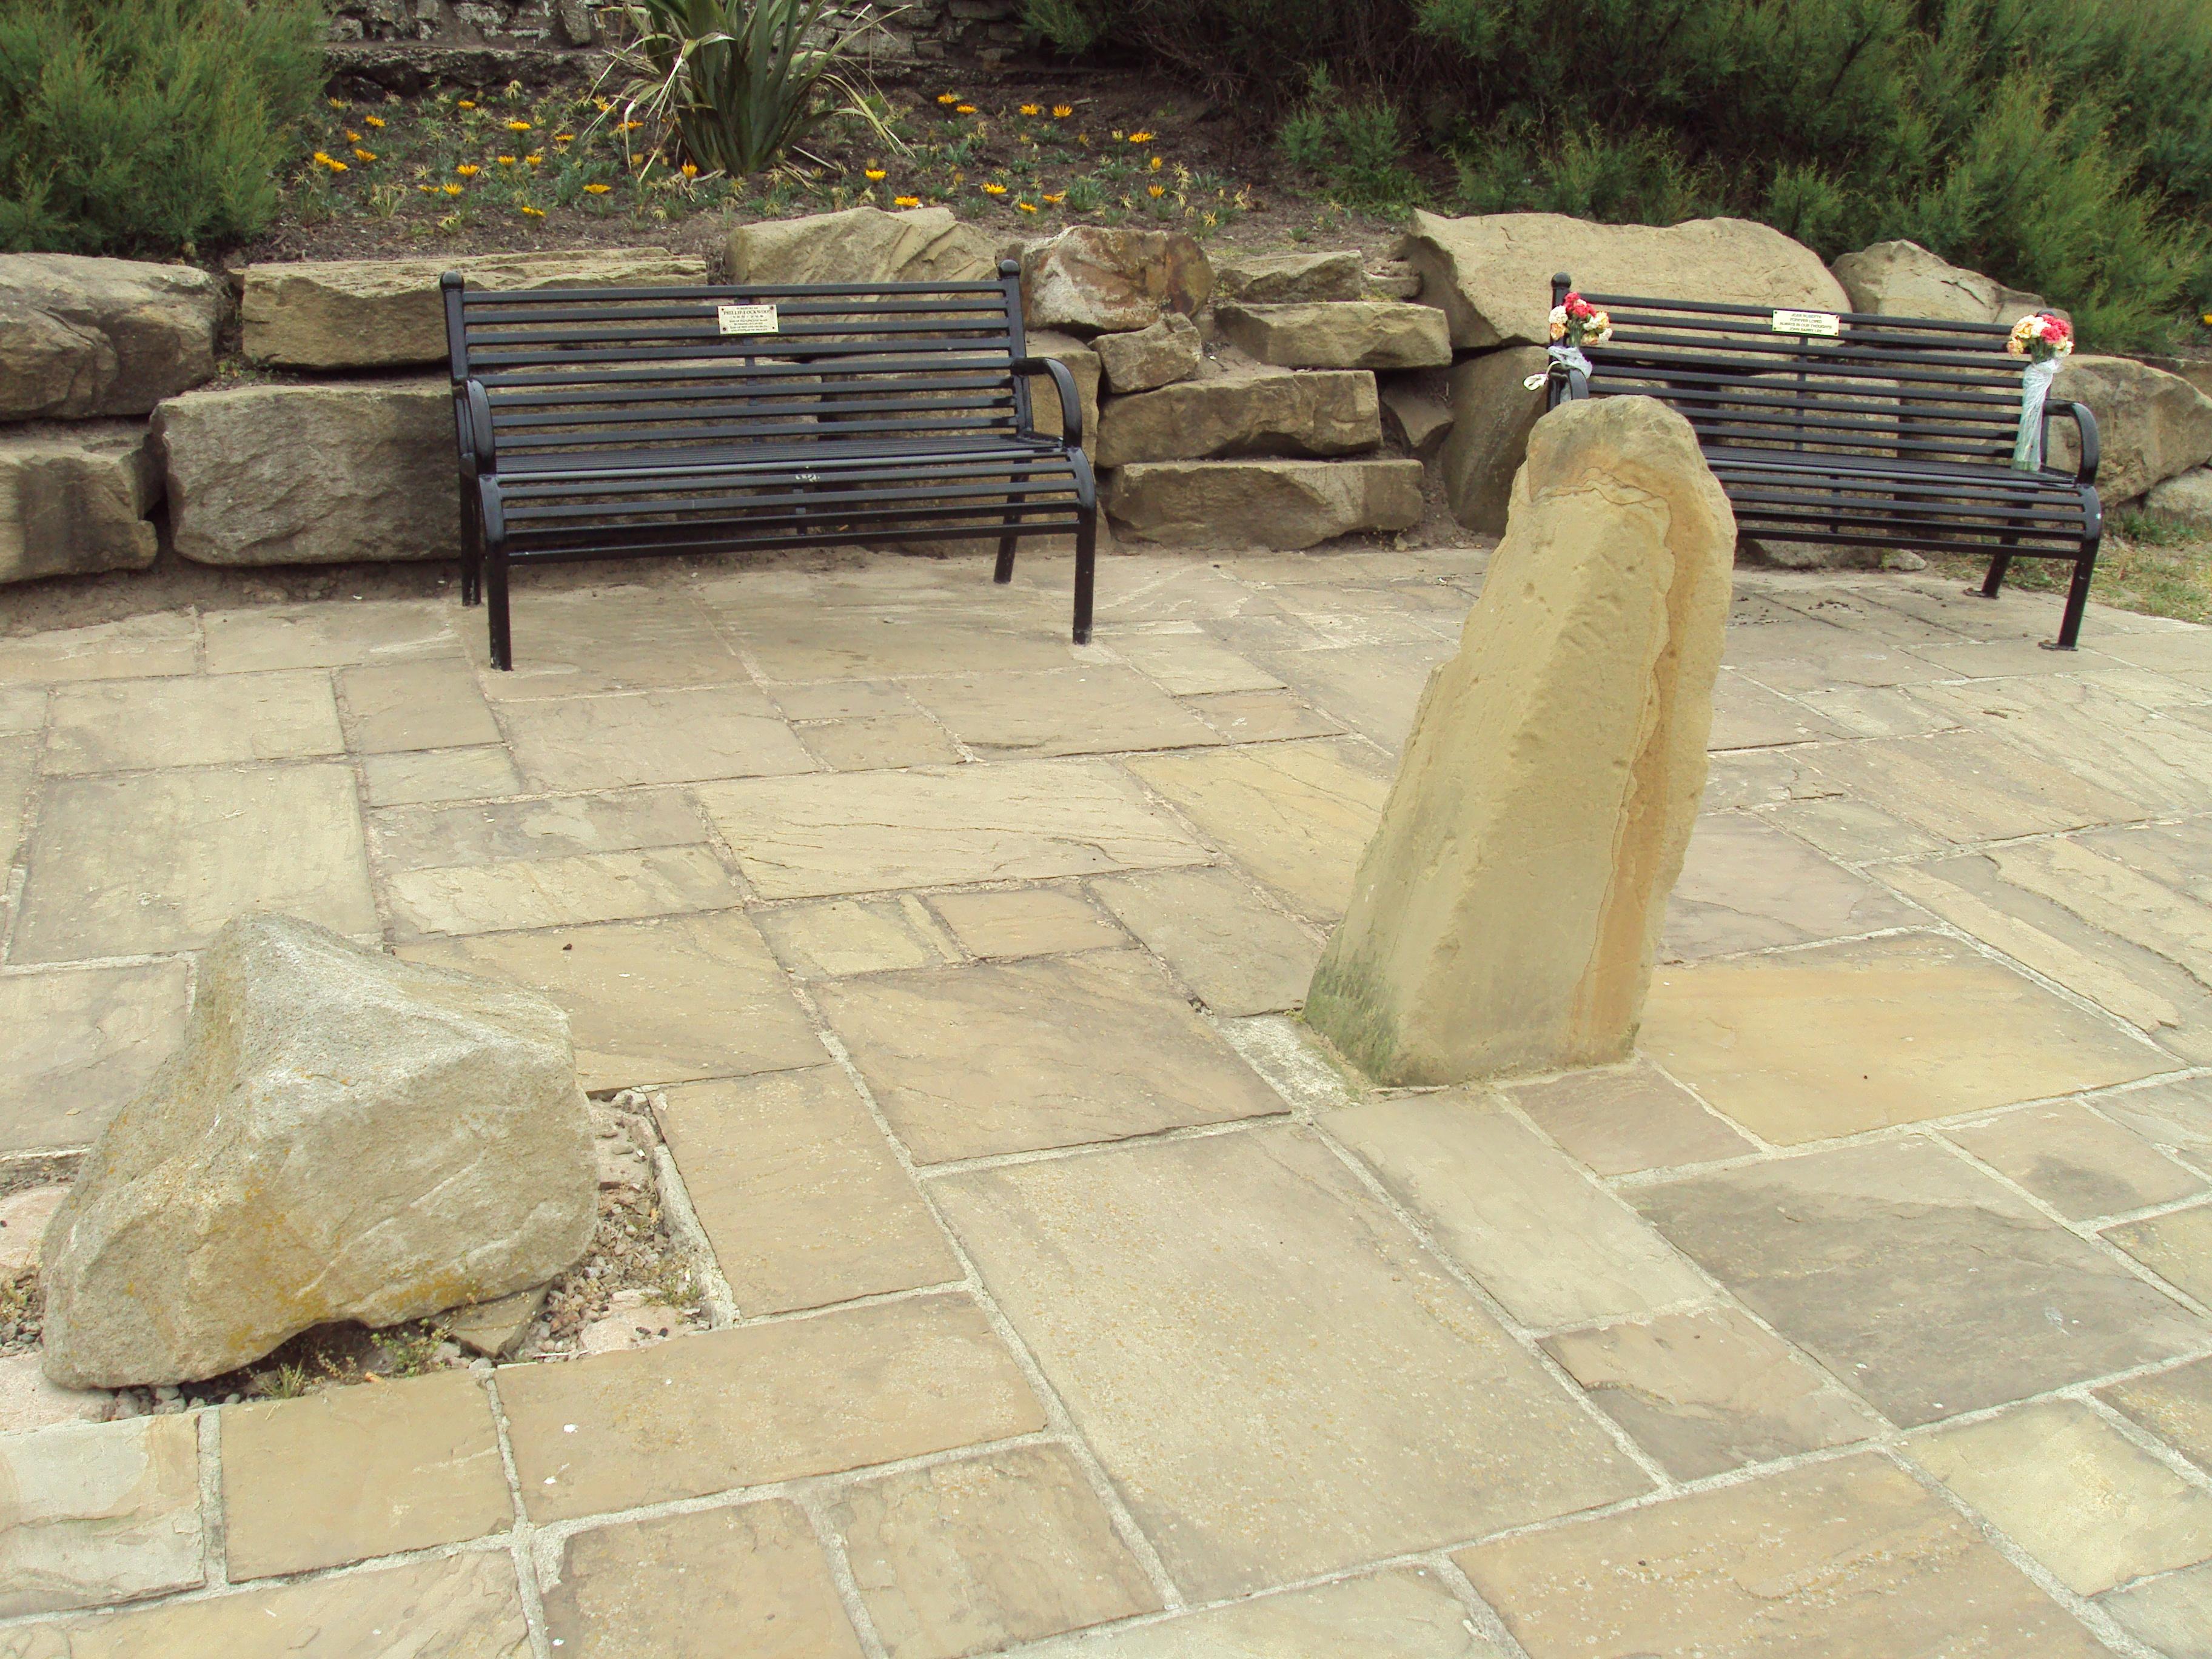 File:Memorial benches, Jubilee Gardens, Blackpool - DSC06666.JPG